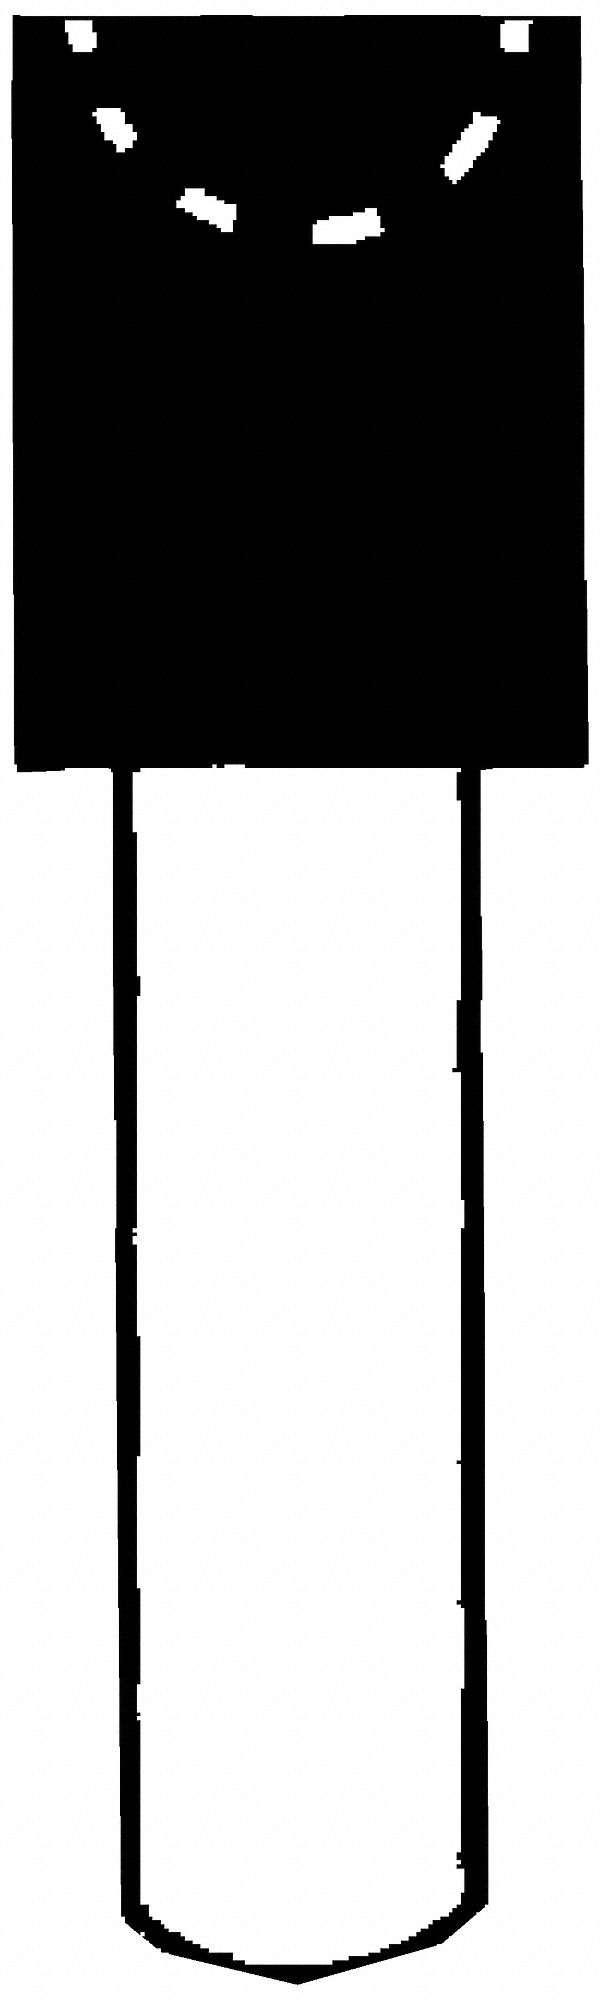 "Norton Medium Vitrified Mounted Point (1/8"" Spindle Diameter). Model: 61463624485"